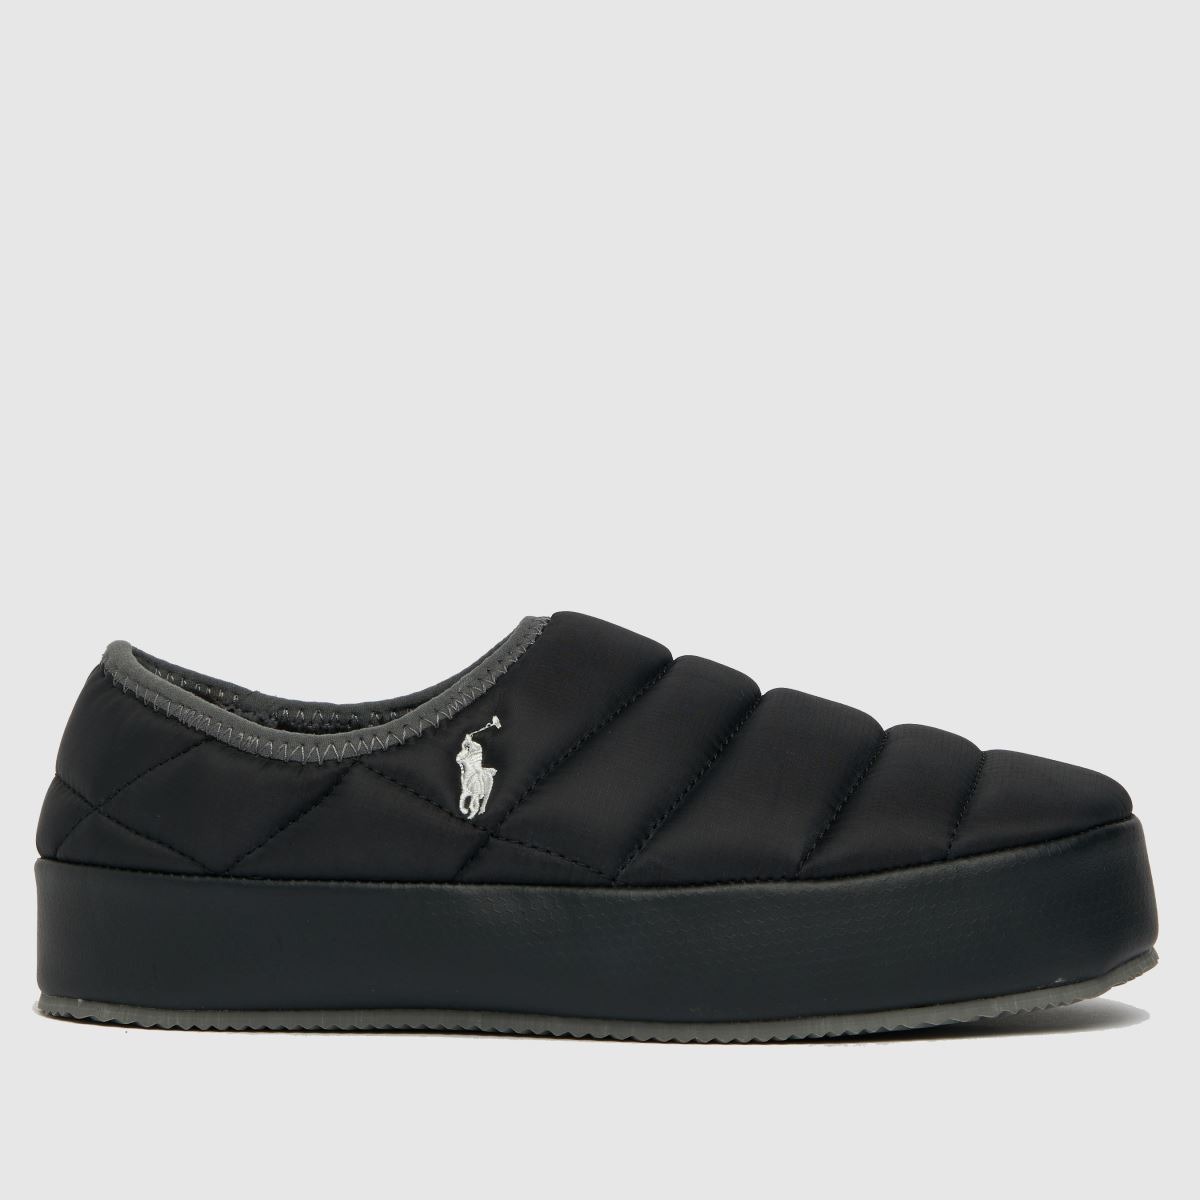 Polo Ralph Lauren Black Maxson Slippers